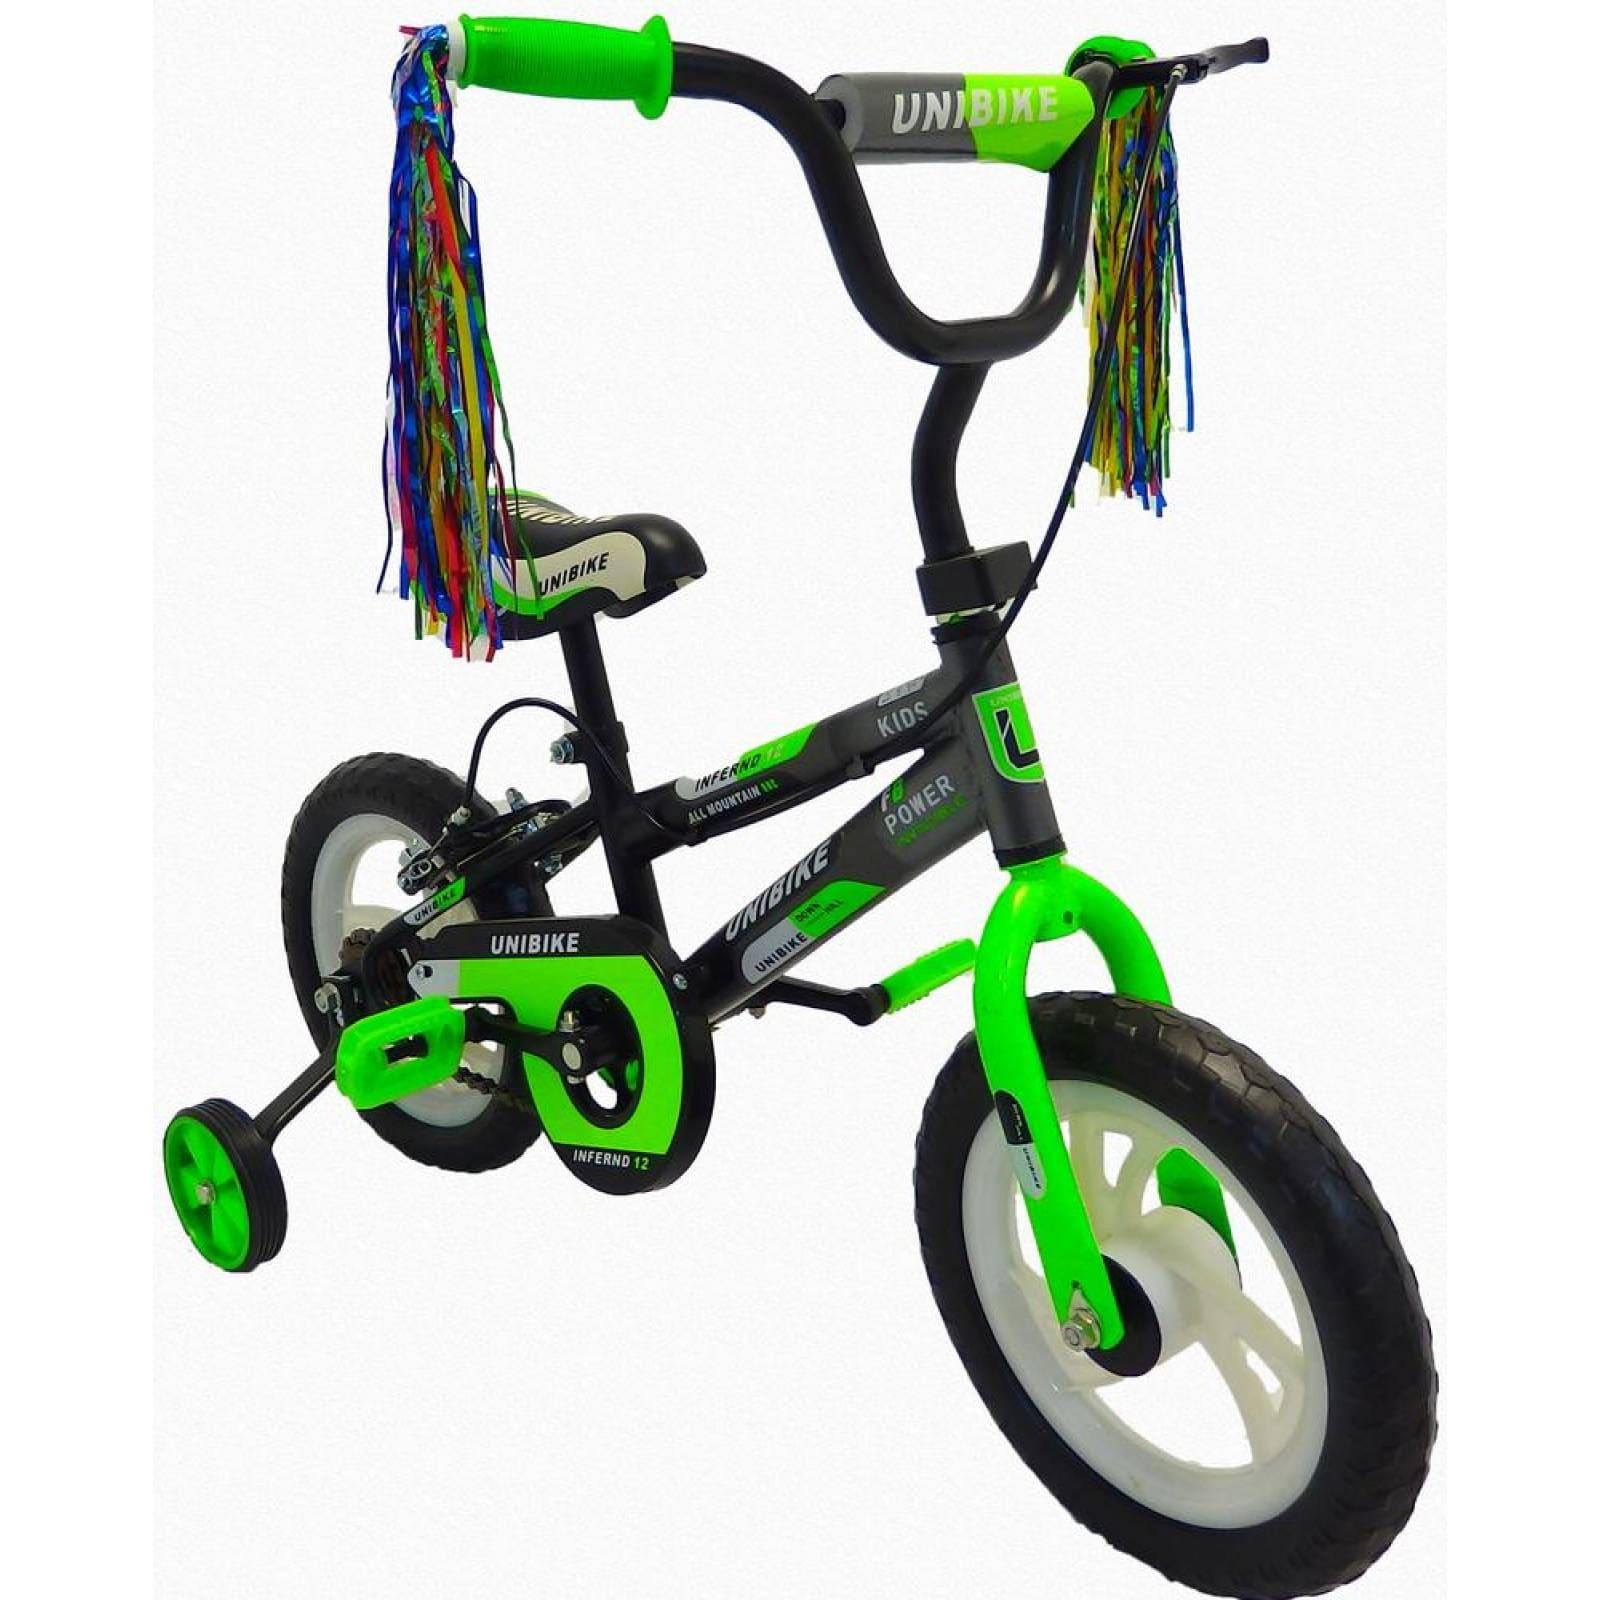 Bicicleta Infantil para niño Rodada 12 con llanta de goma VerdeNegro